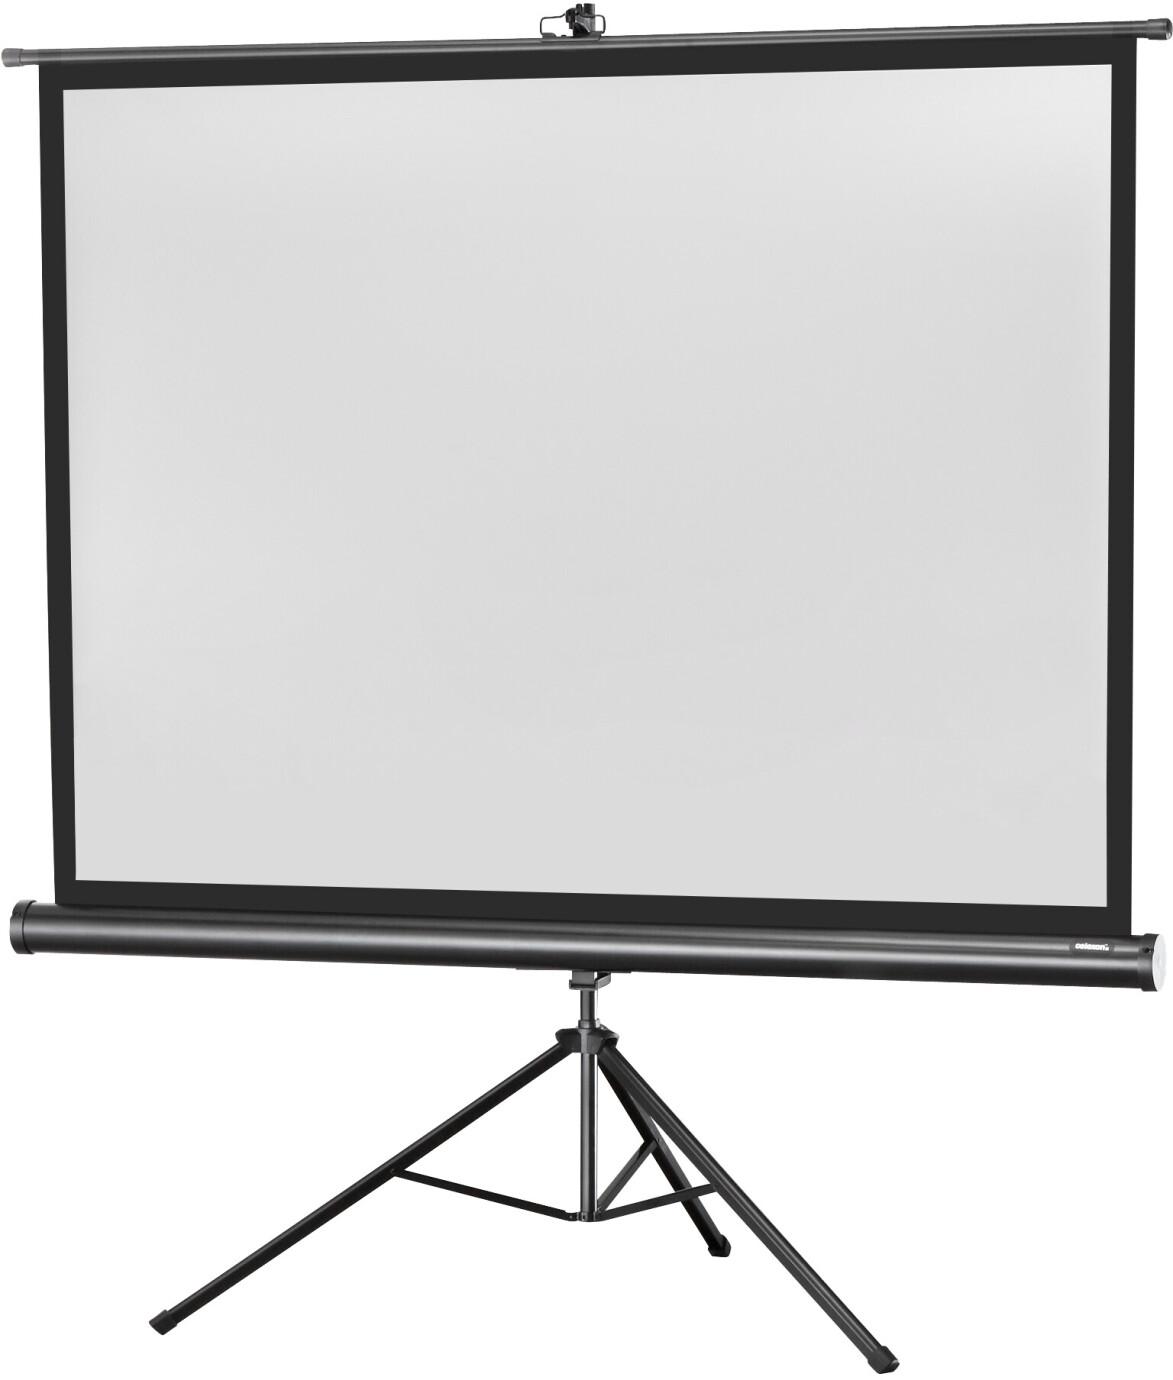 celexon Stativleinwand Economy 176 x 132 cm